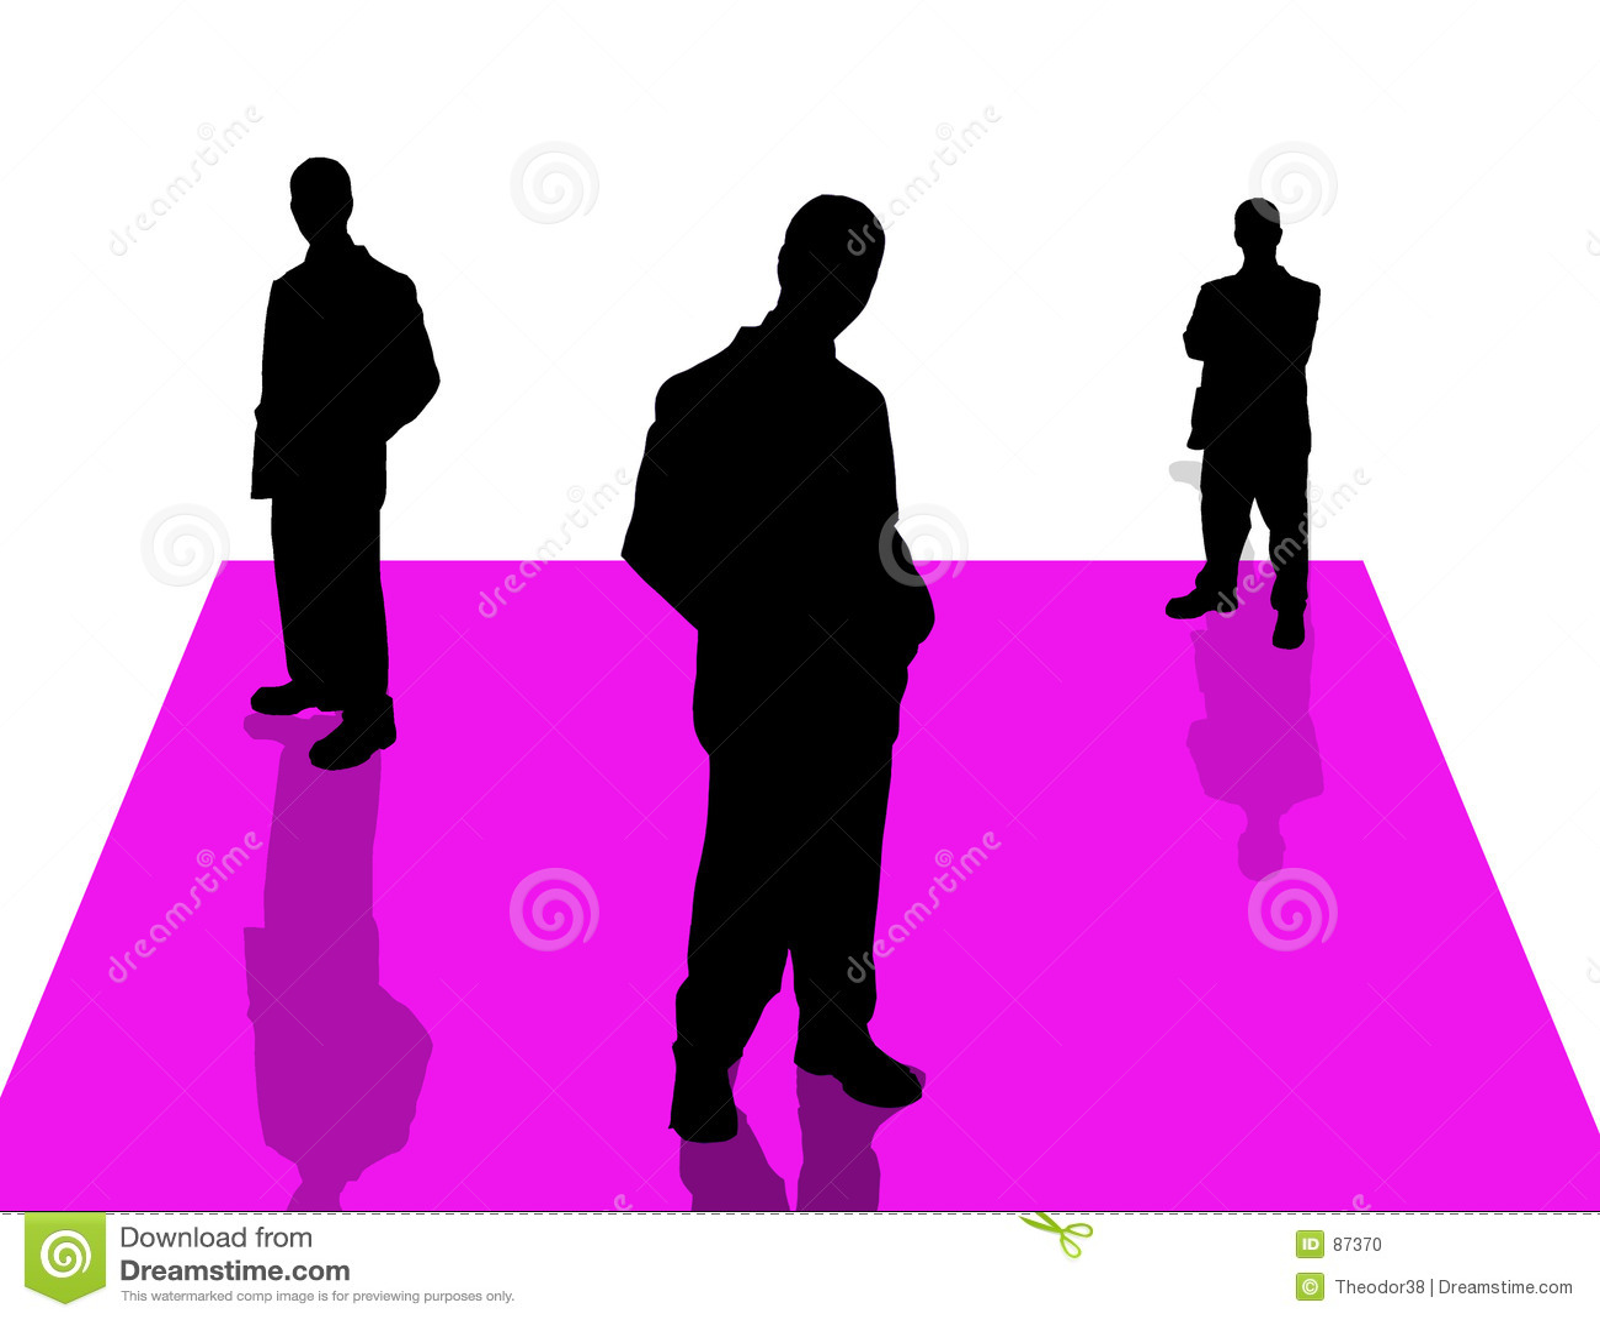 6 бизнесменов теней